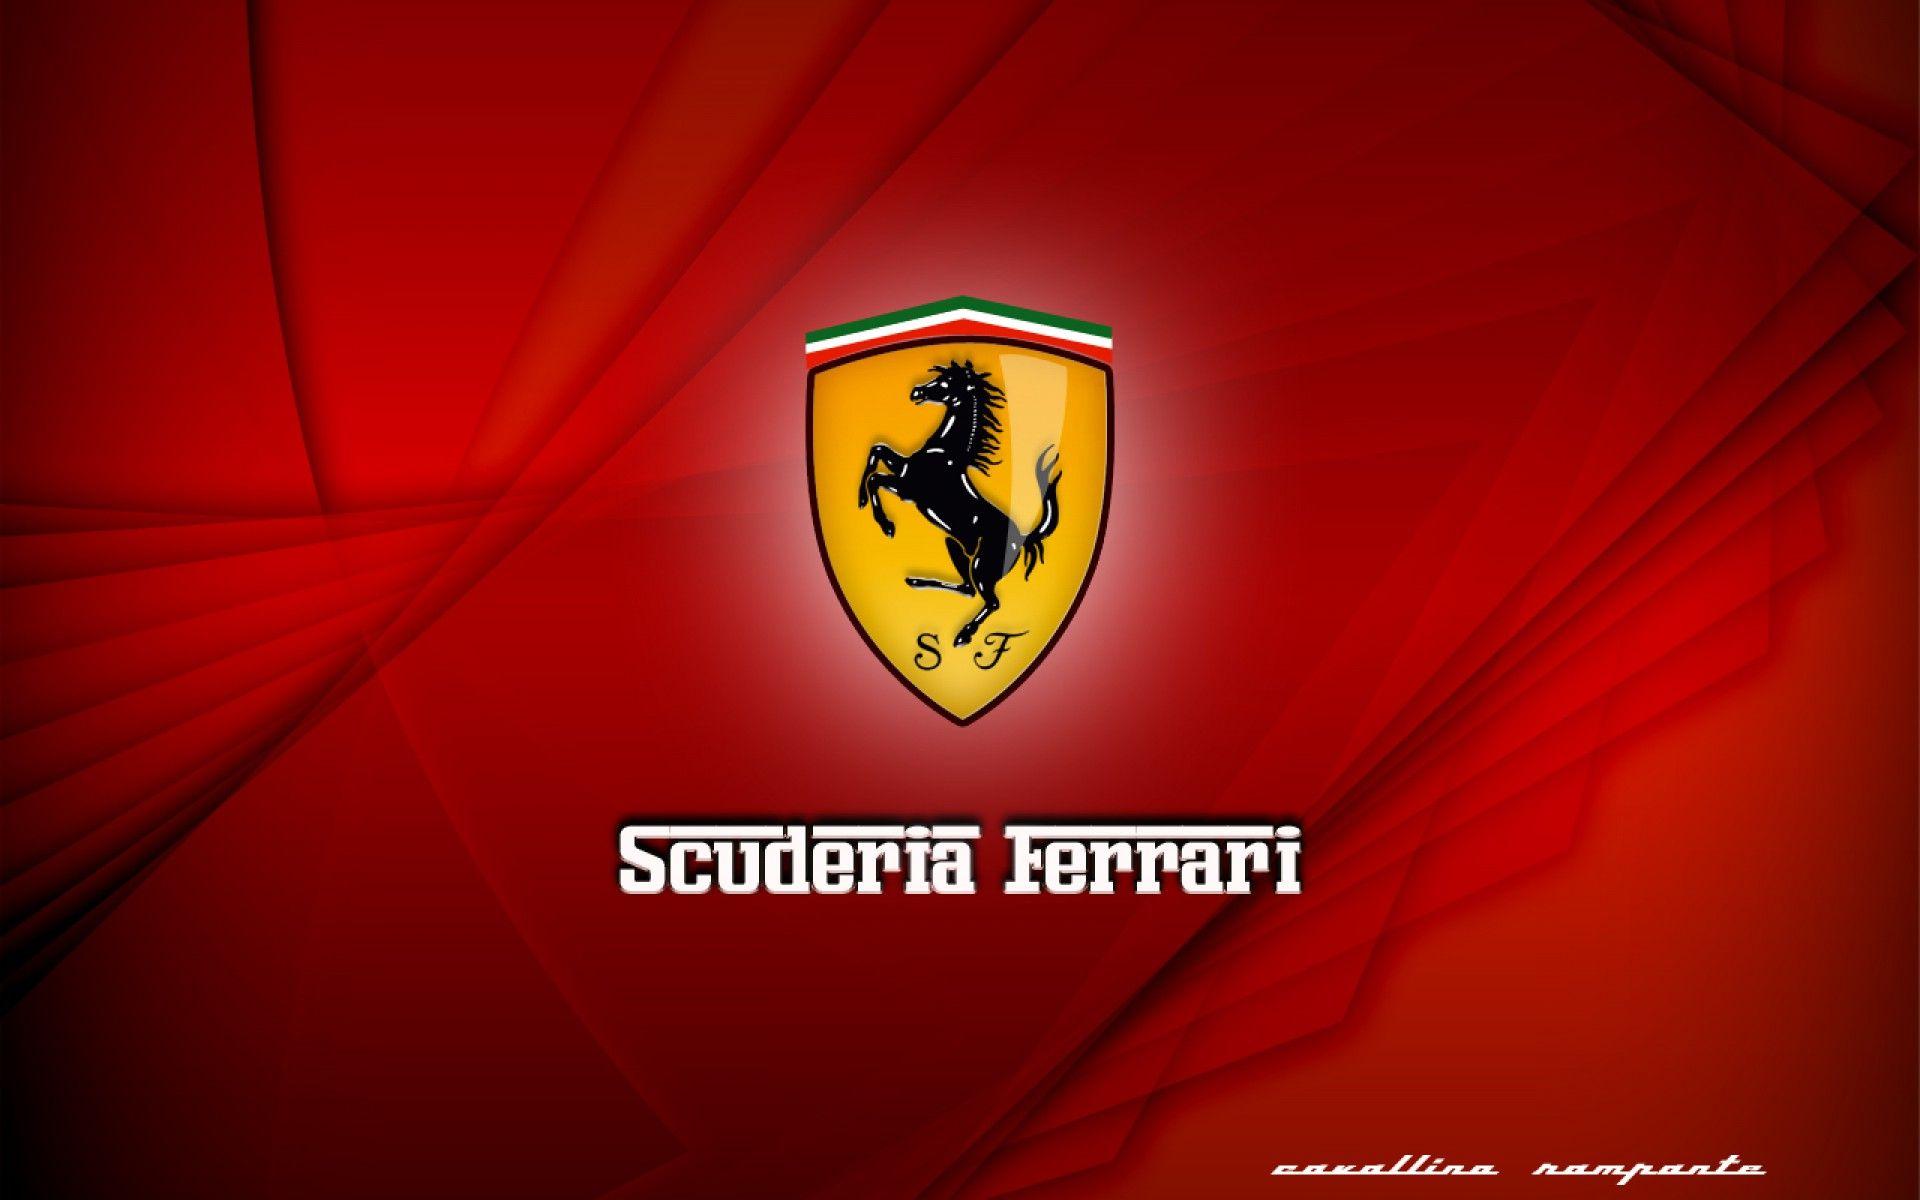 You Can Download Ferrari Logo Hd Wallpapers Here Ferrari Logo Hd